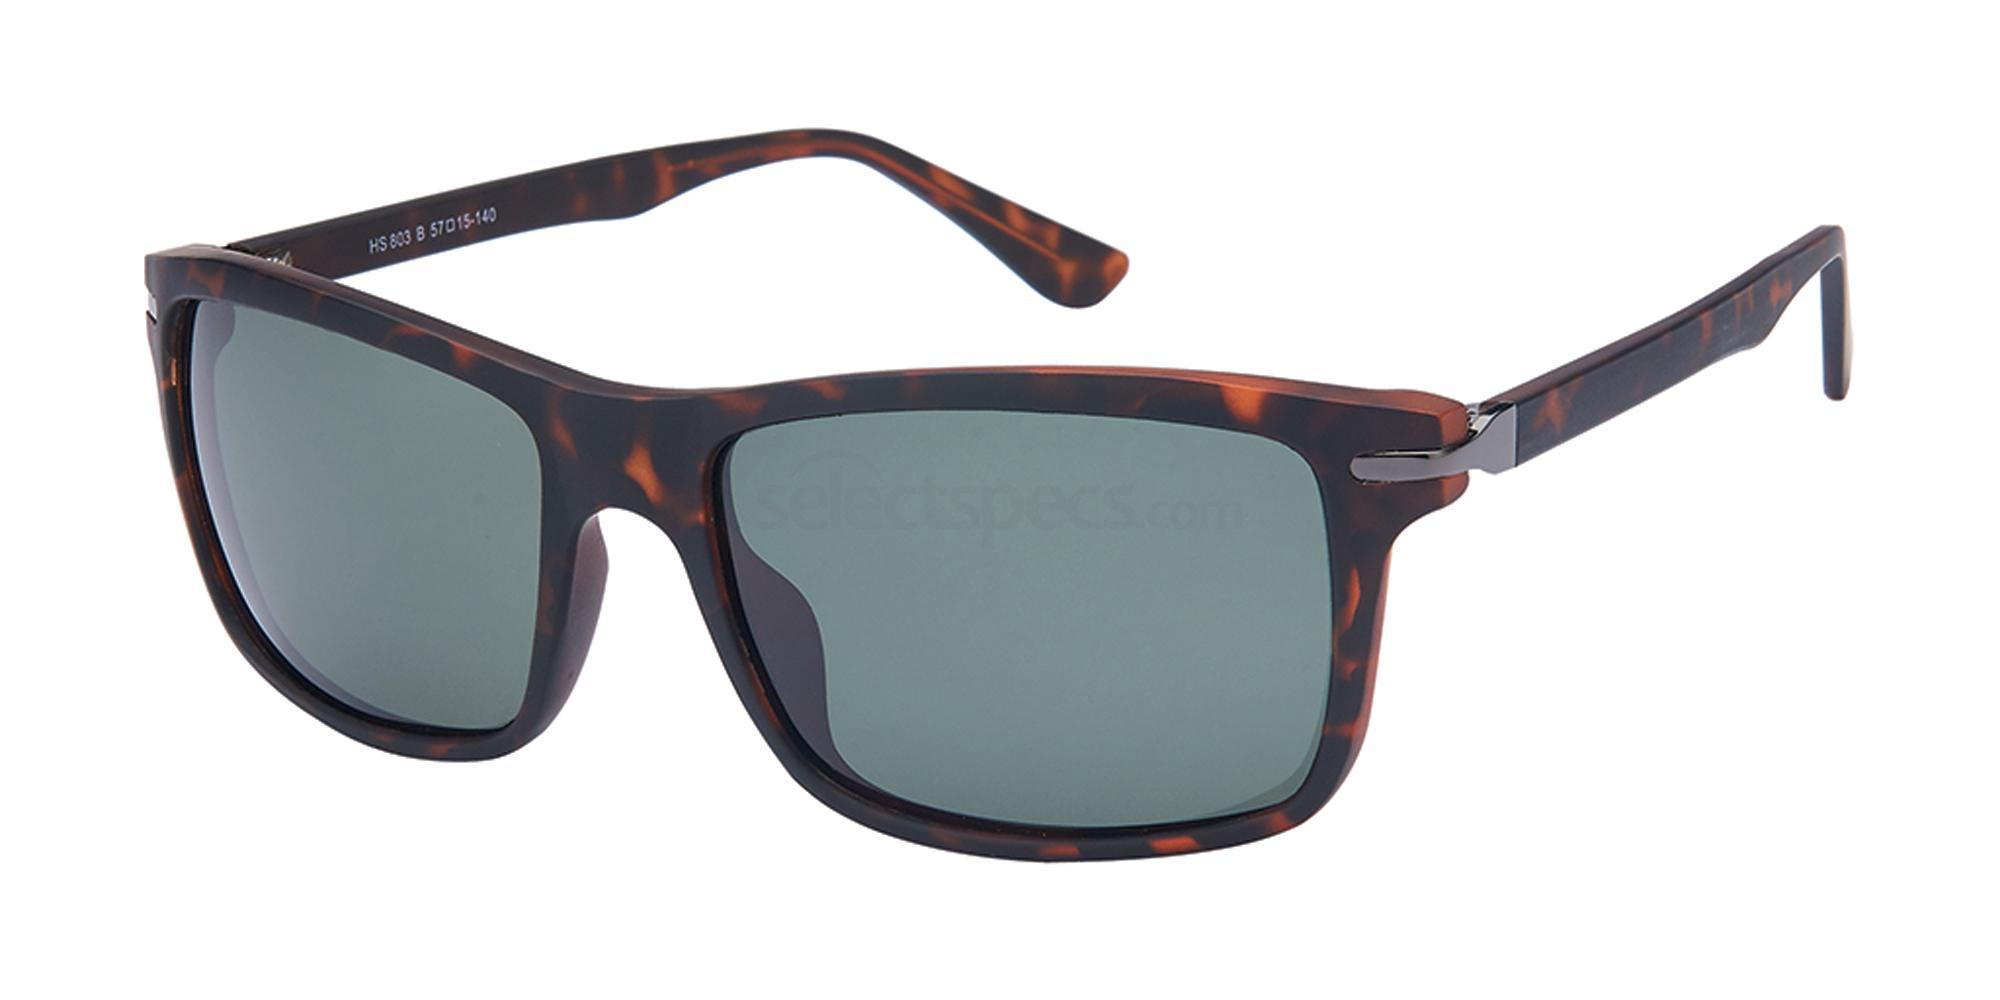 B HS803 Sunglasses, Halstrom